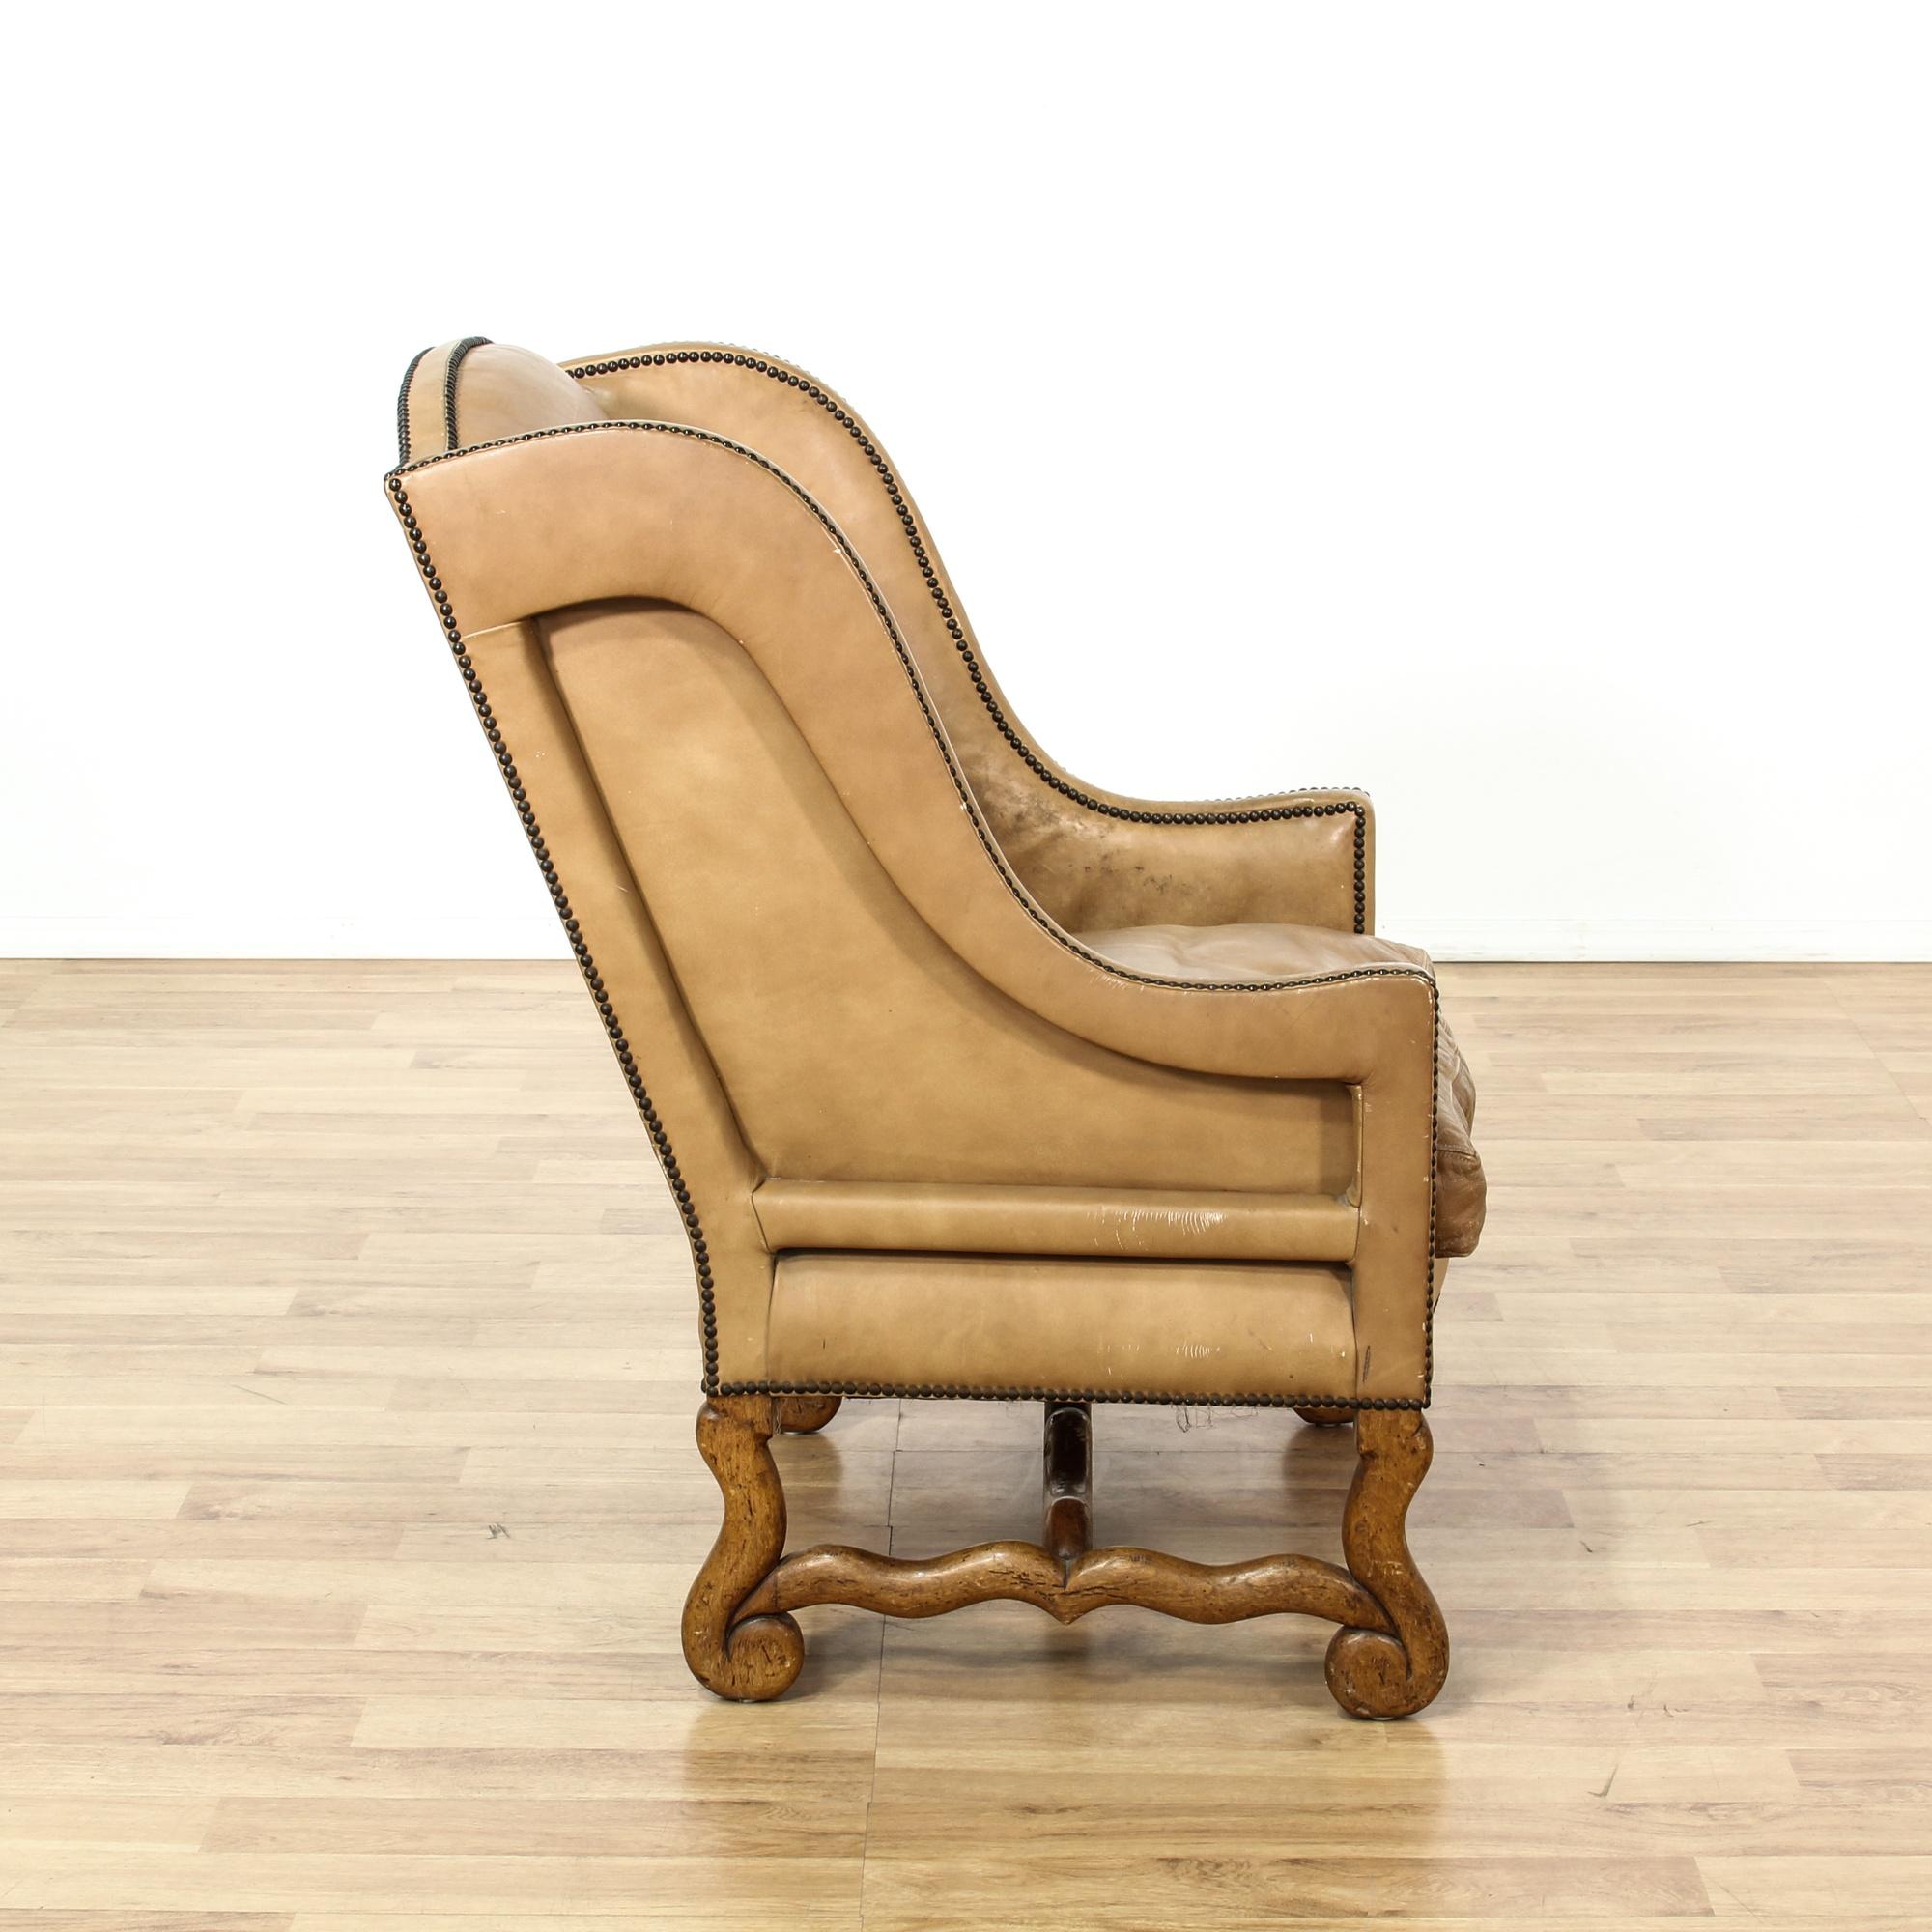 Studded Tan Leather Wingback Armchair Loveseat Vintage